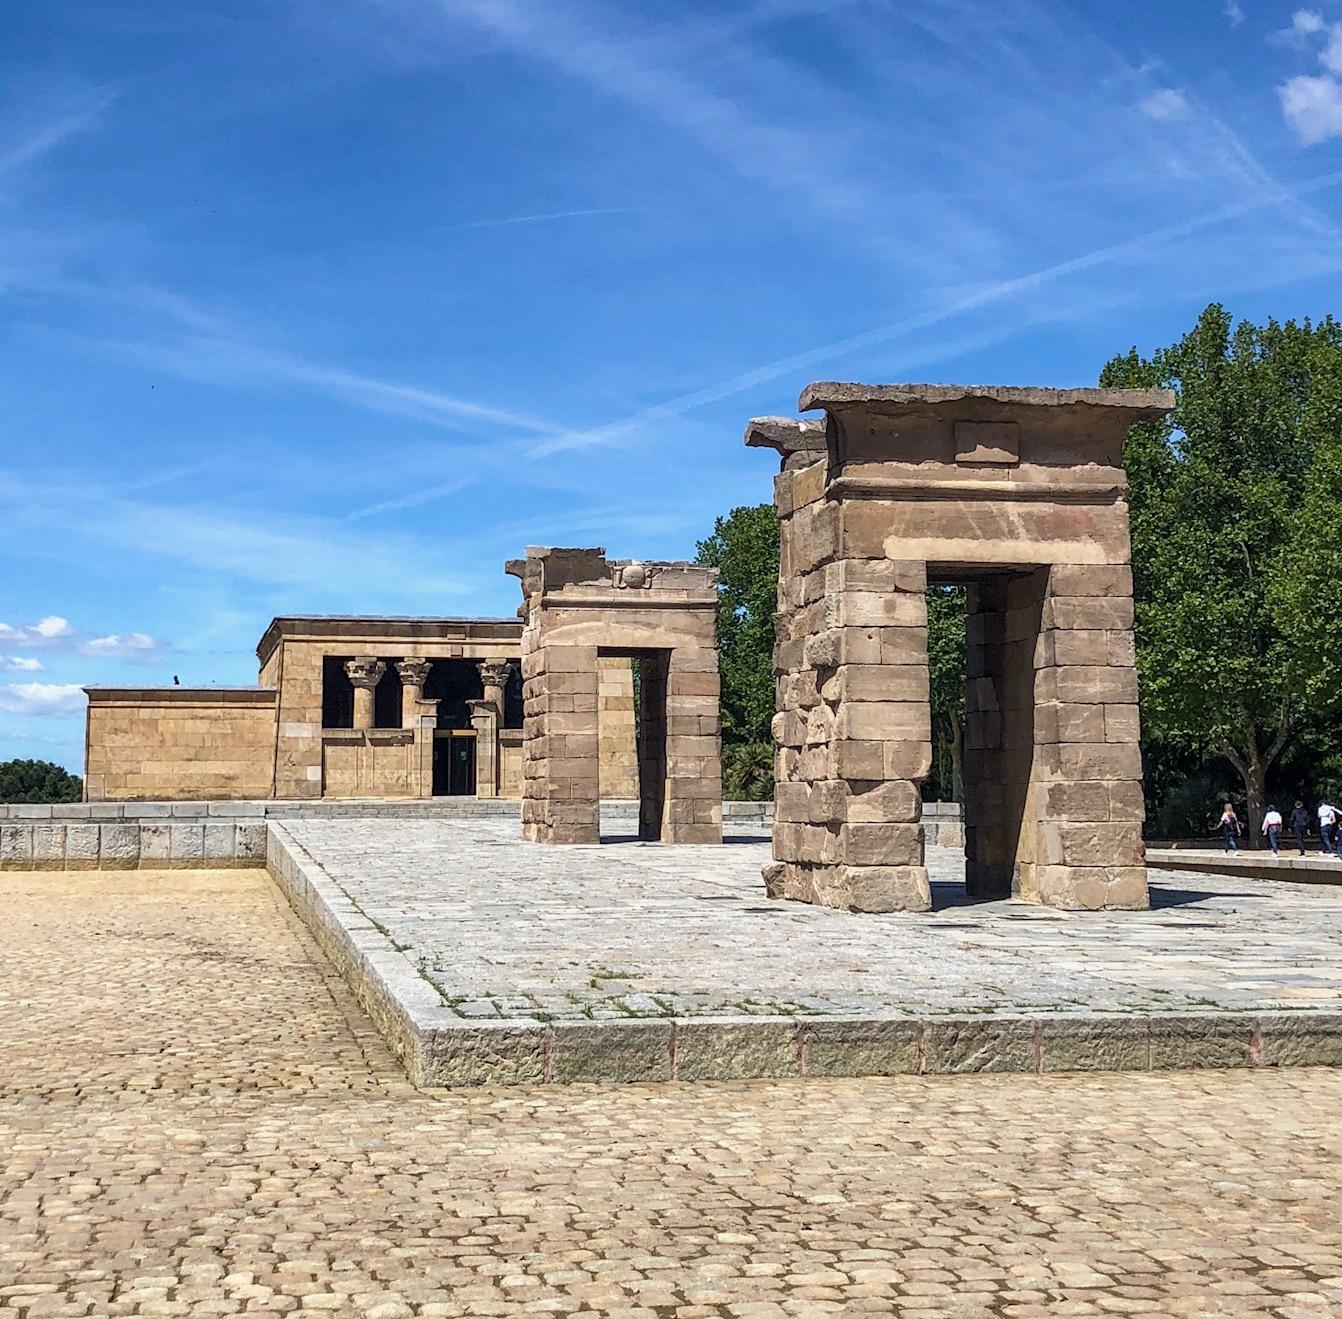 Templo de Debod - Madrid Spain - Ancient Egyptian Temple